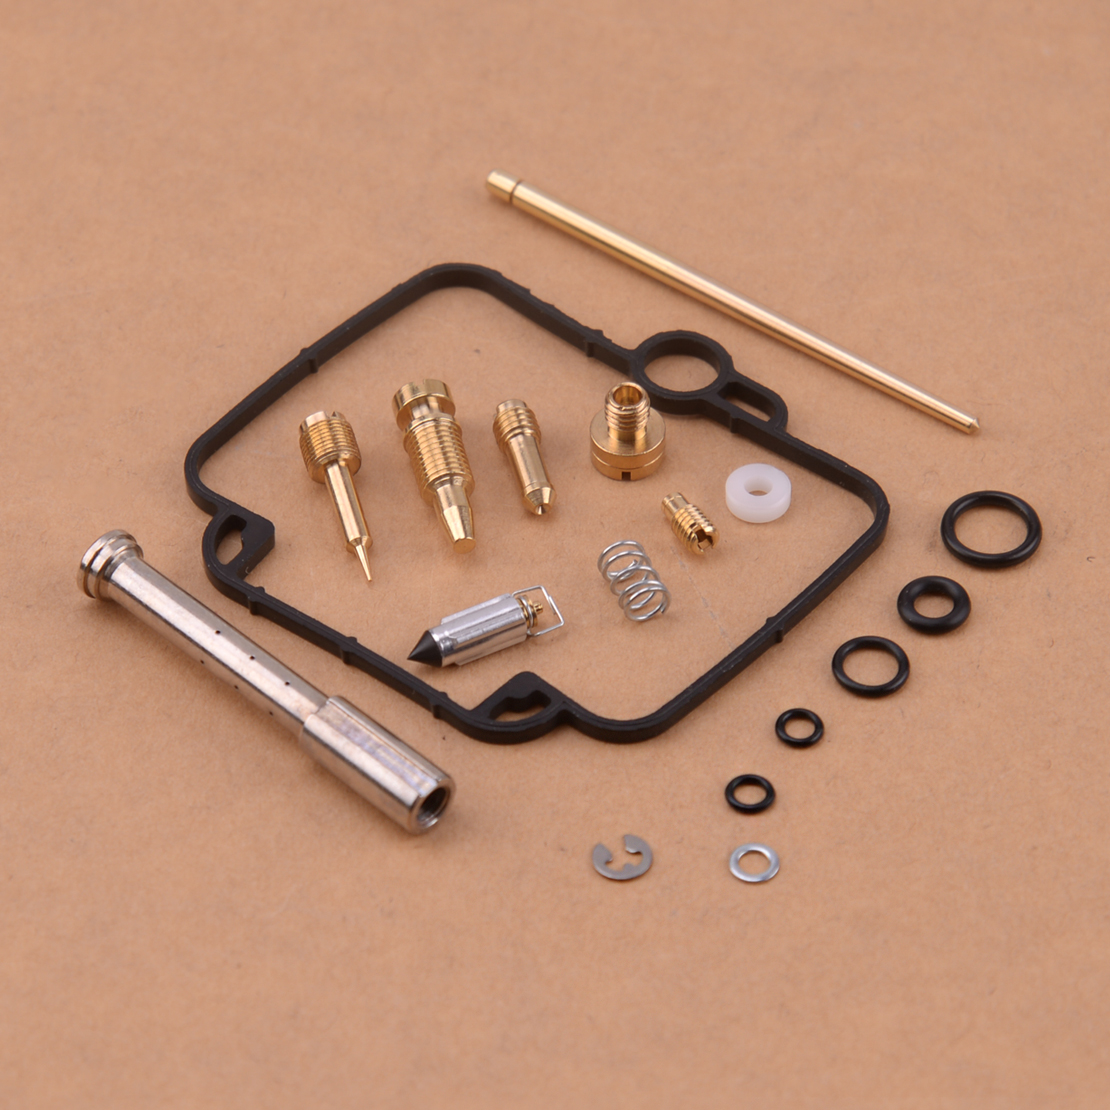 US $13 25 22% OFF Aliexpress com : Buy DWCX KS 0555 Carburetor Rebuild Carb  Repair Jets Gasket Fit For Suzuki DR650 DR650SE DR 650 650SE from Reliable